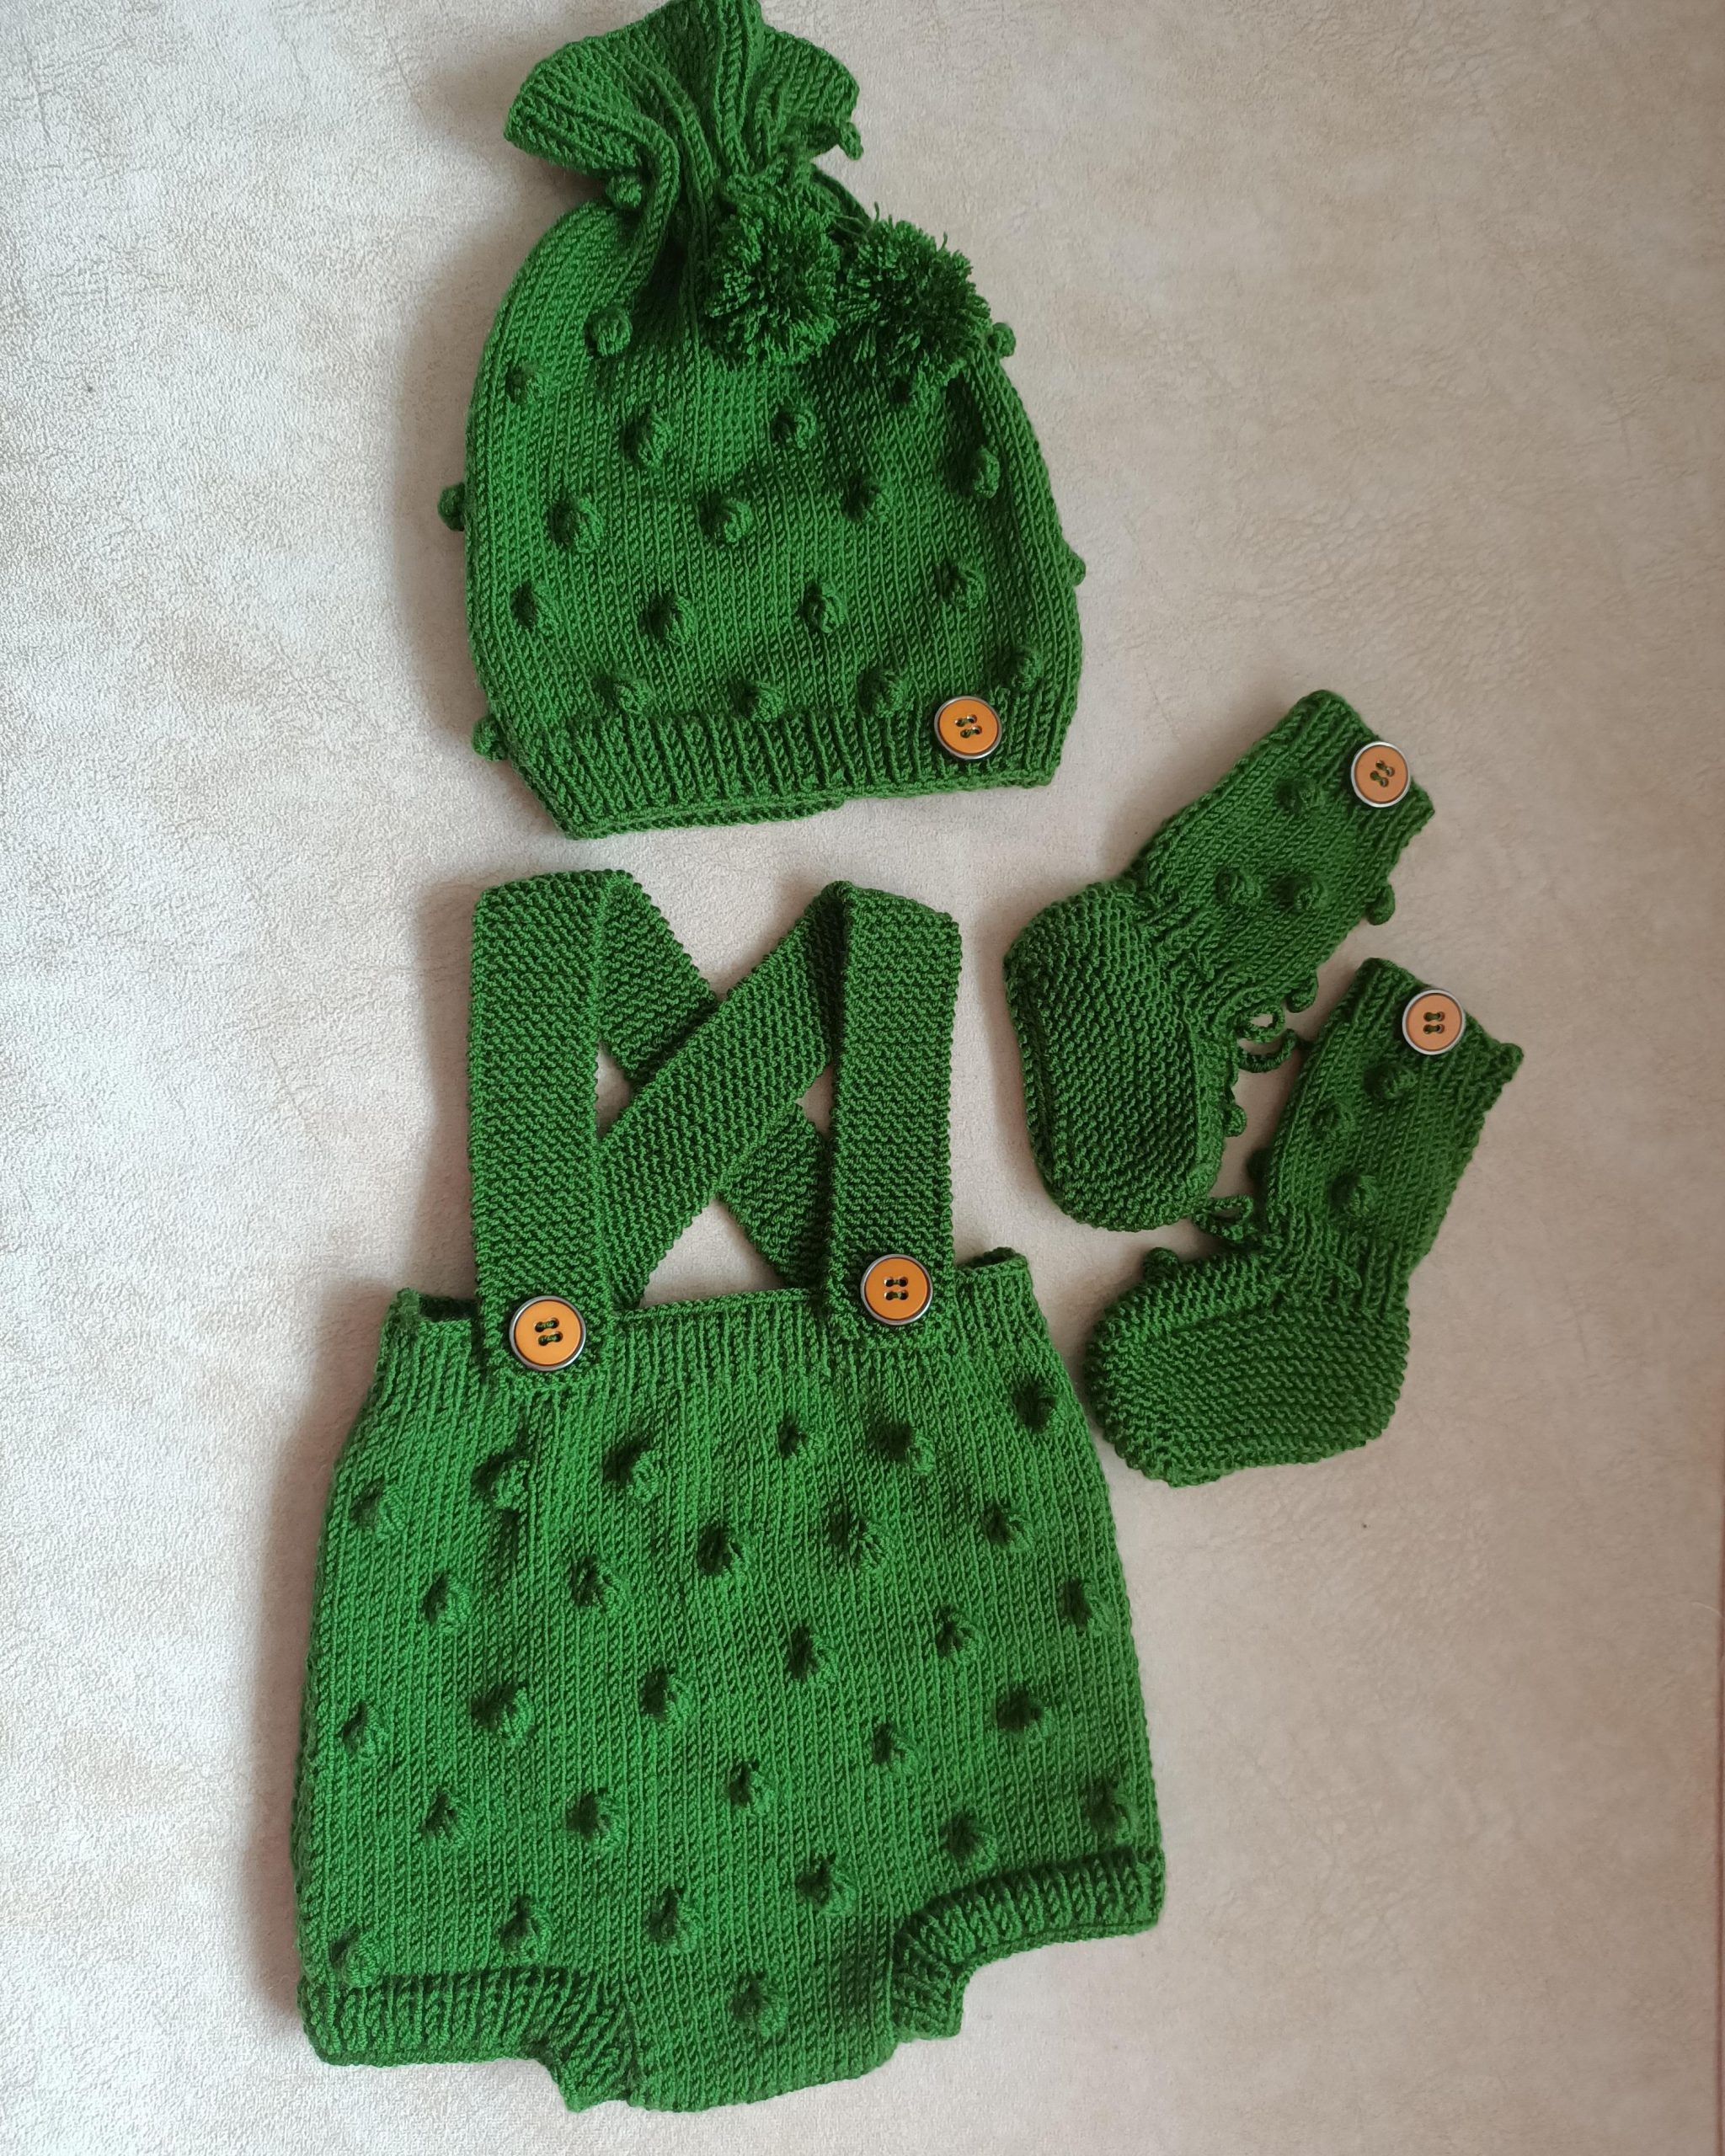 7ke7wogg4lj61 scaled - I made a gift for a newborn baby - hobbies, crafts